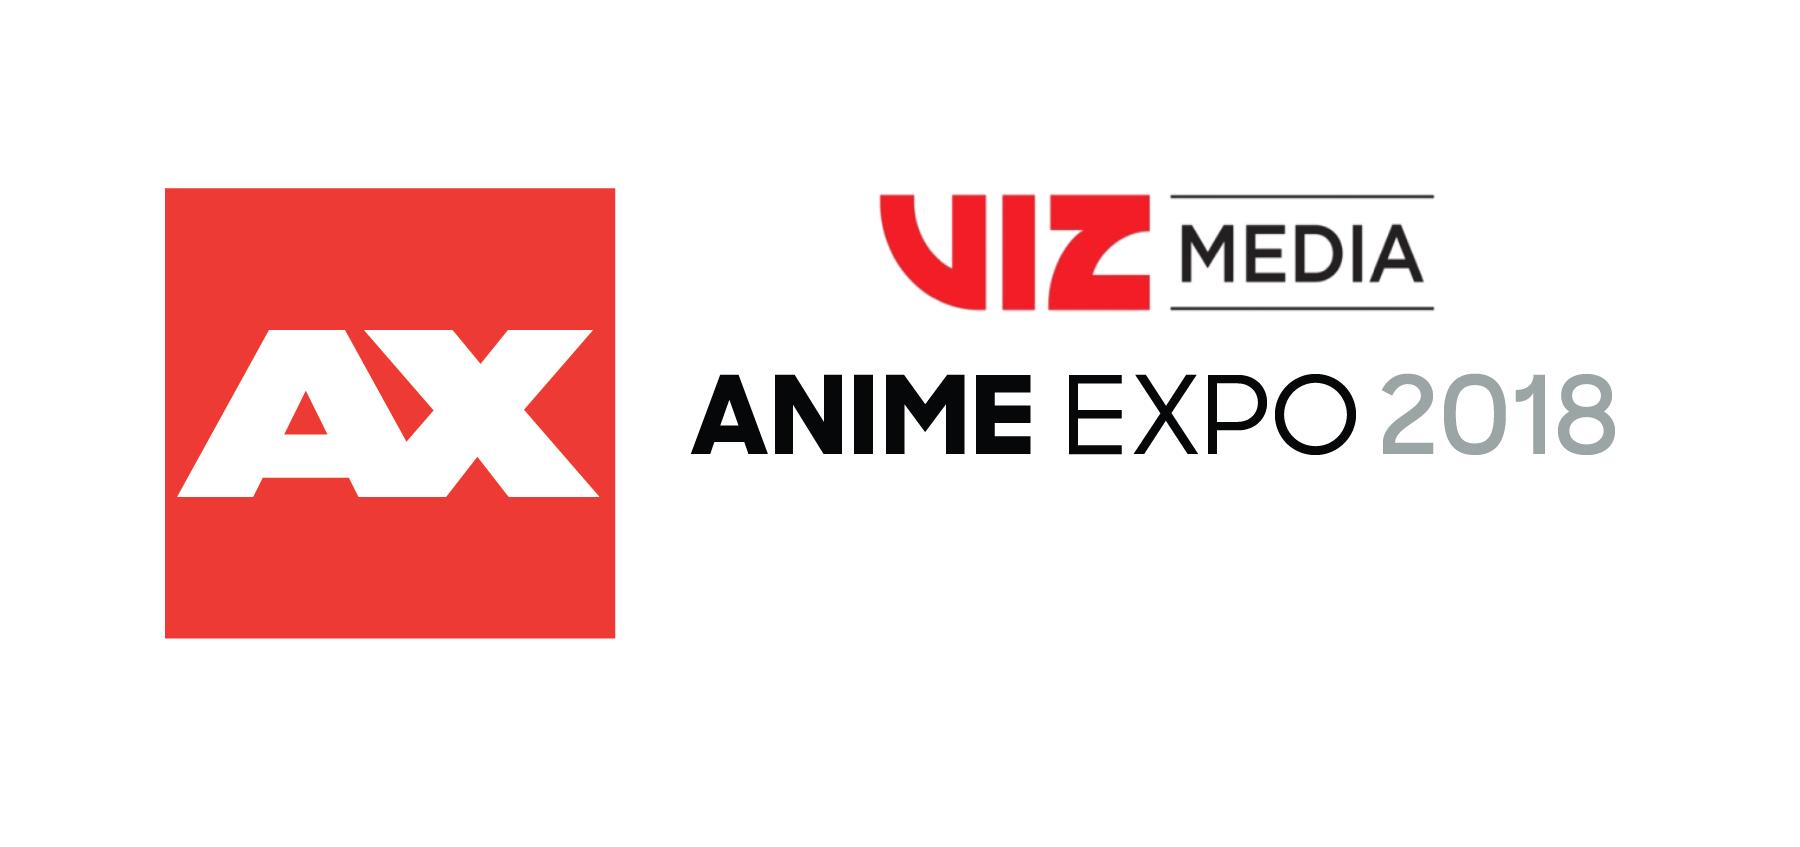 Press Release: VIZ Media Announces Anime Expo 2018 Guests & Activities!